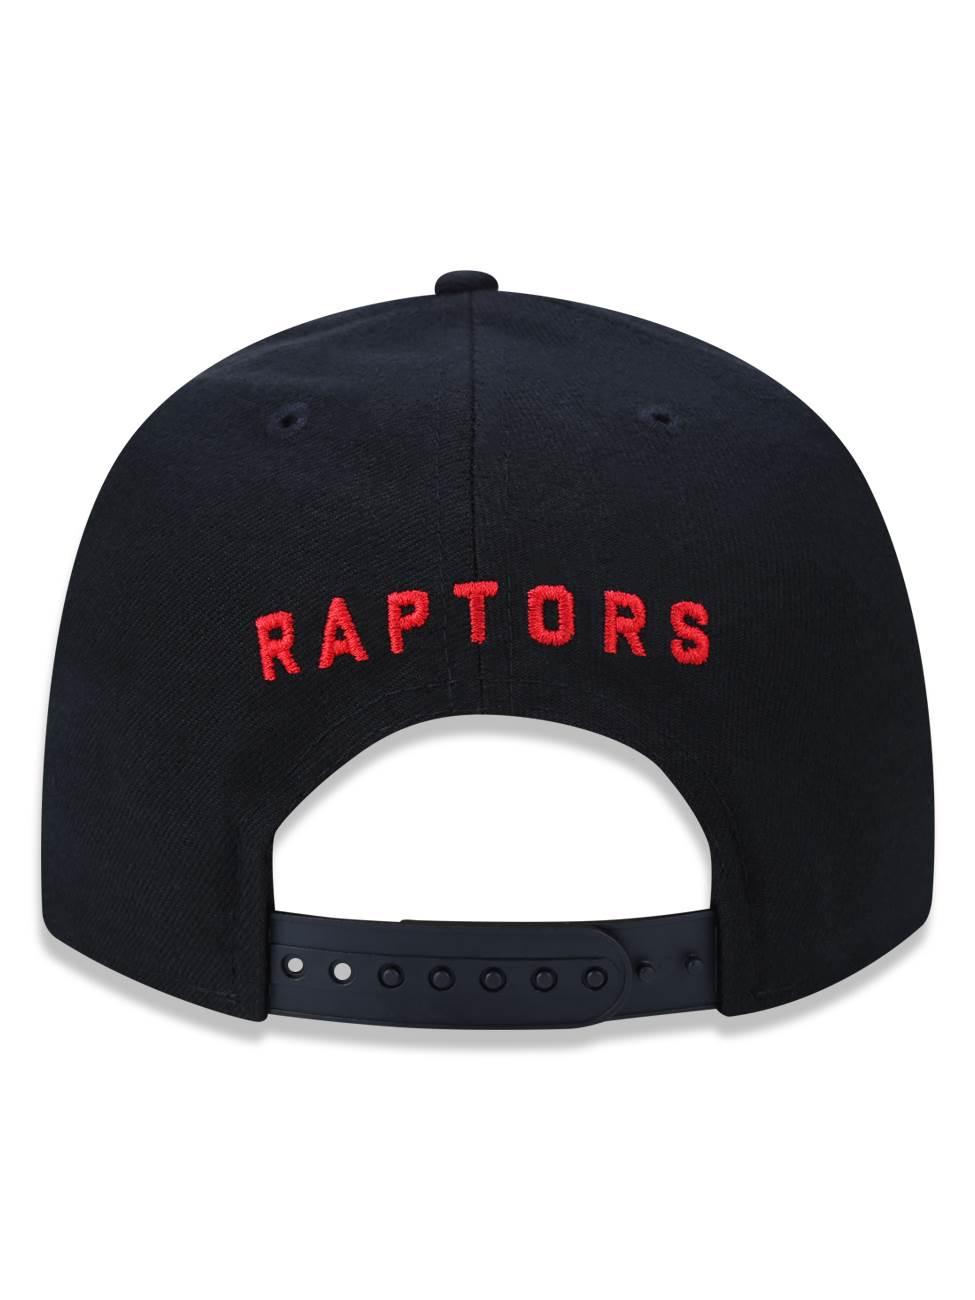 Boné New Era 9fifty NBA Toronto Raptors Black